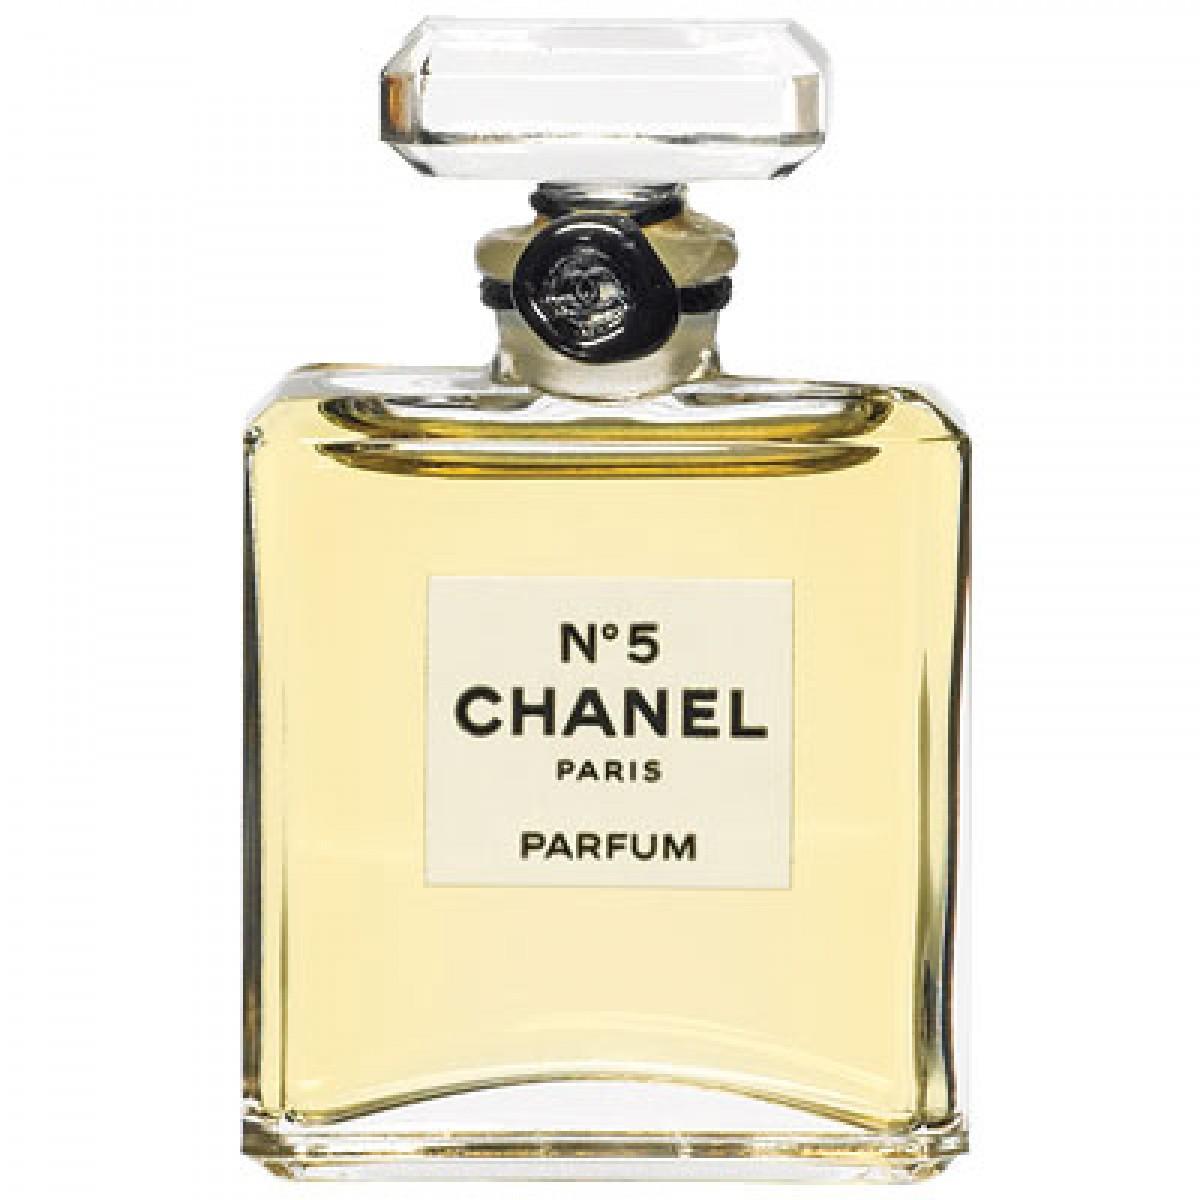 Perfume | The Velvet Lady